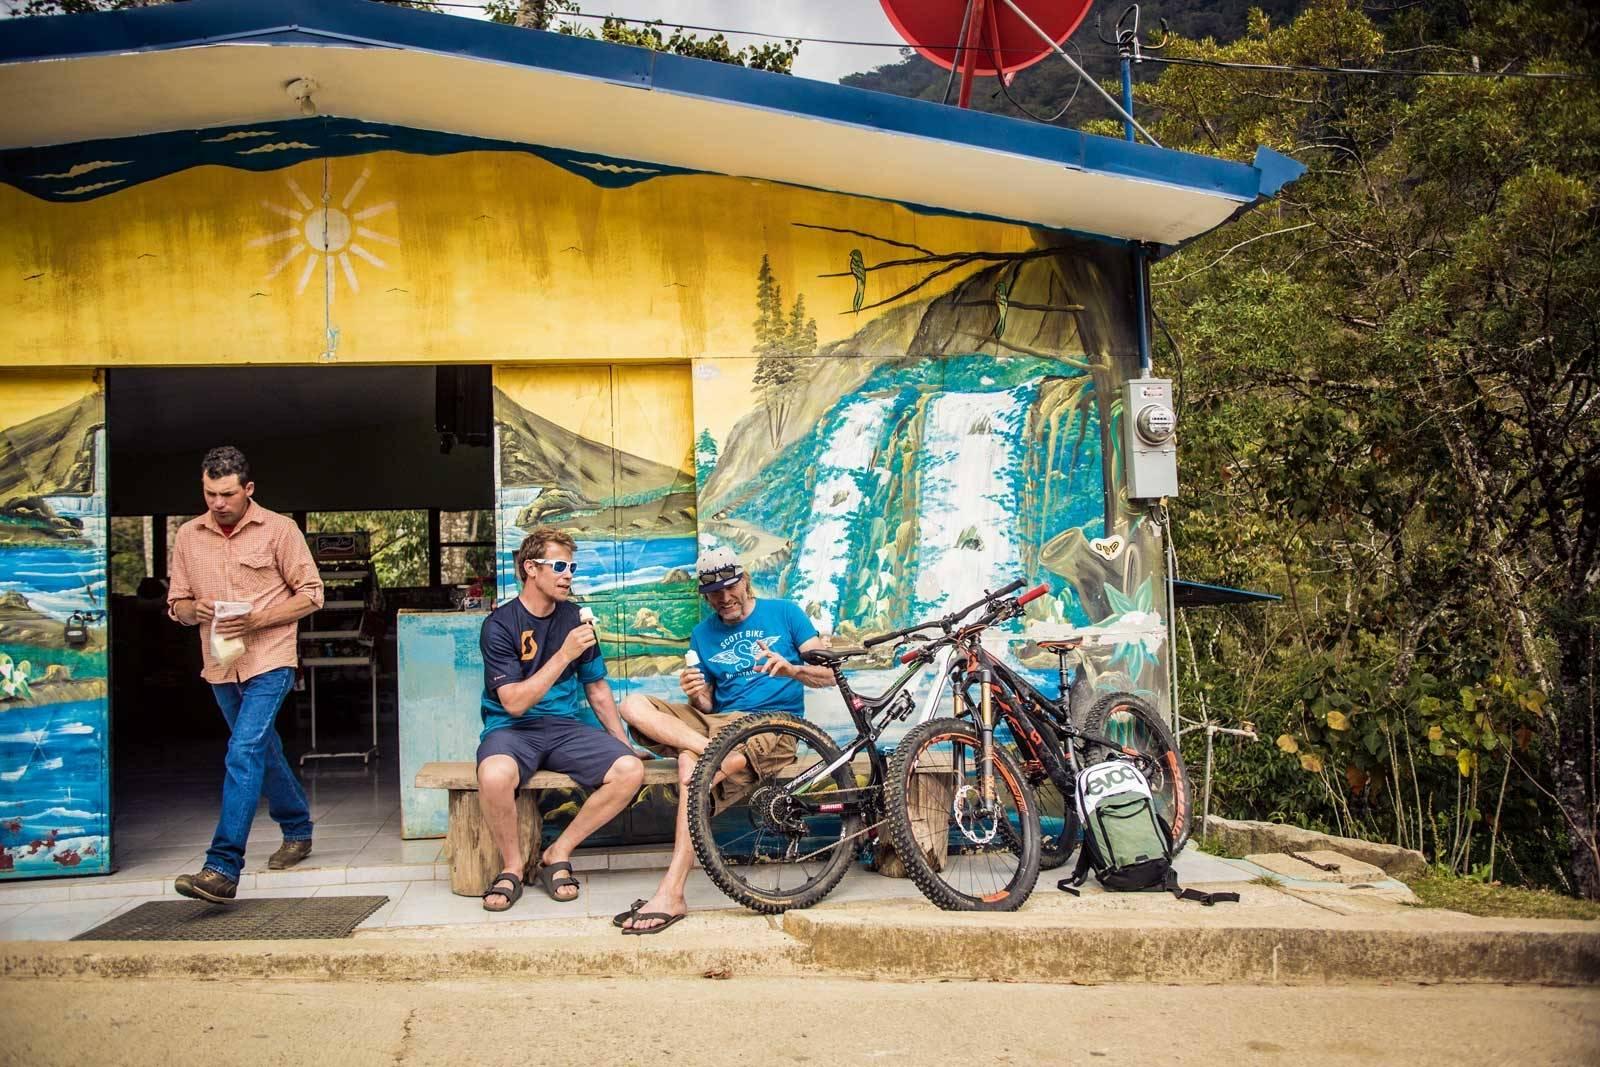 Stisykling-Costa-Rica-7